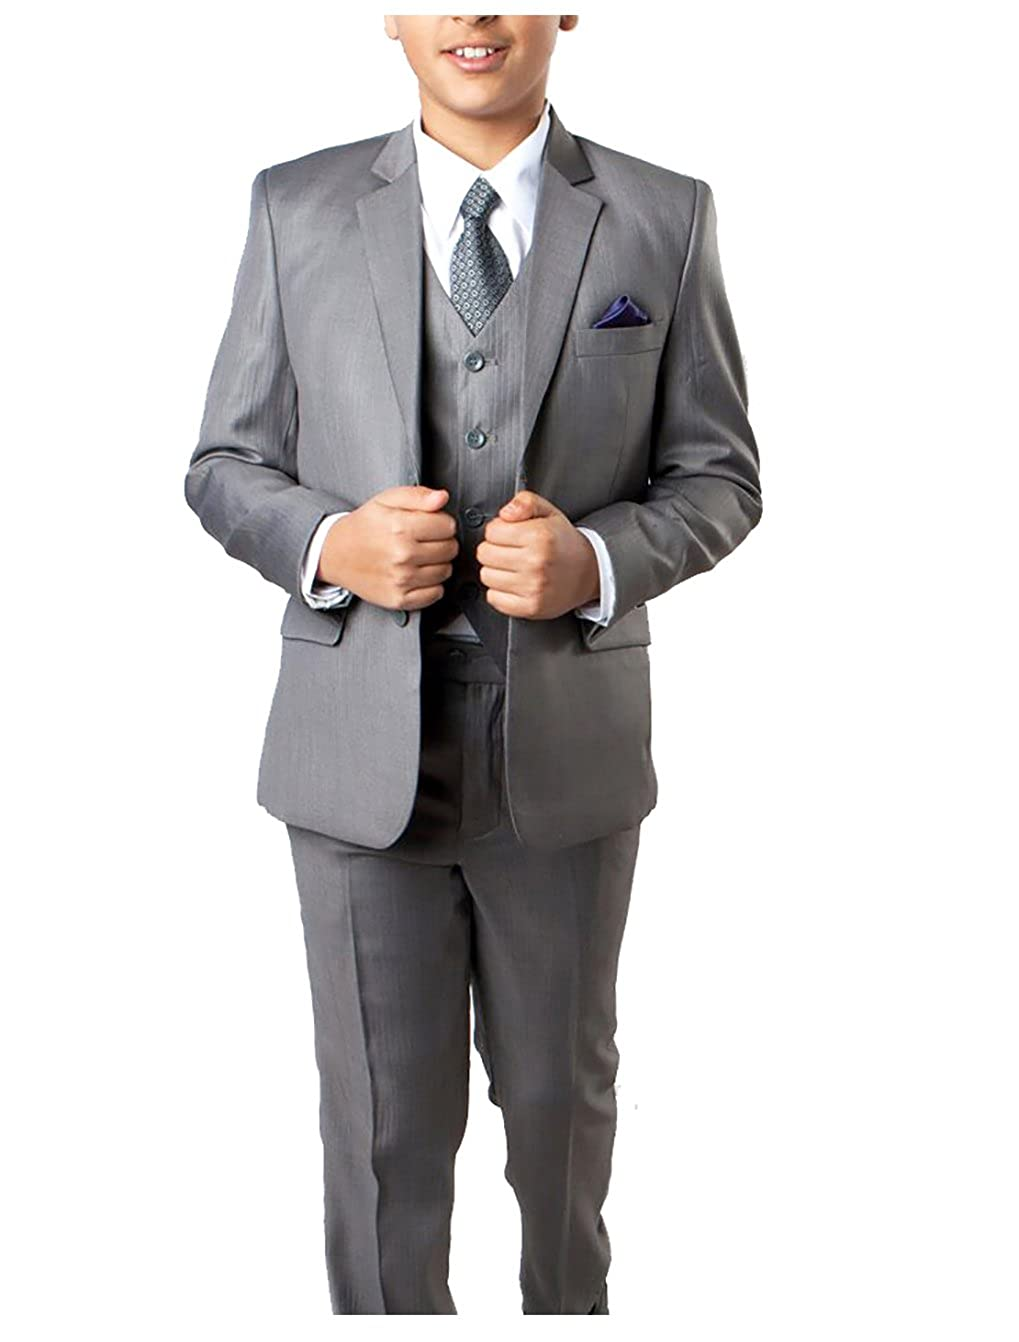 Tonal Stripe Boys Suit With Vest TAZIO Lite Grey 5 Pc Dress Shirt and Tie